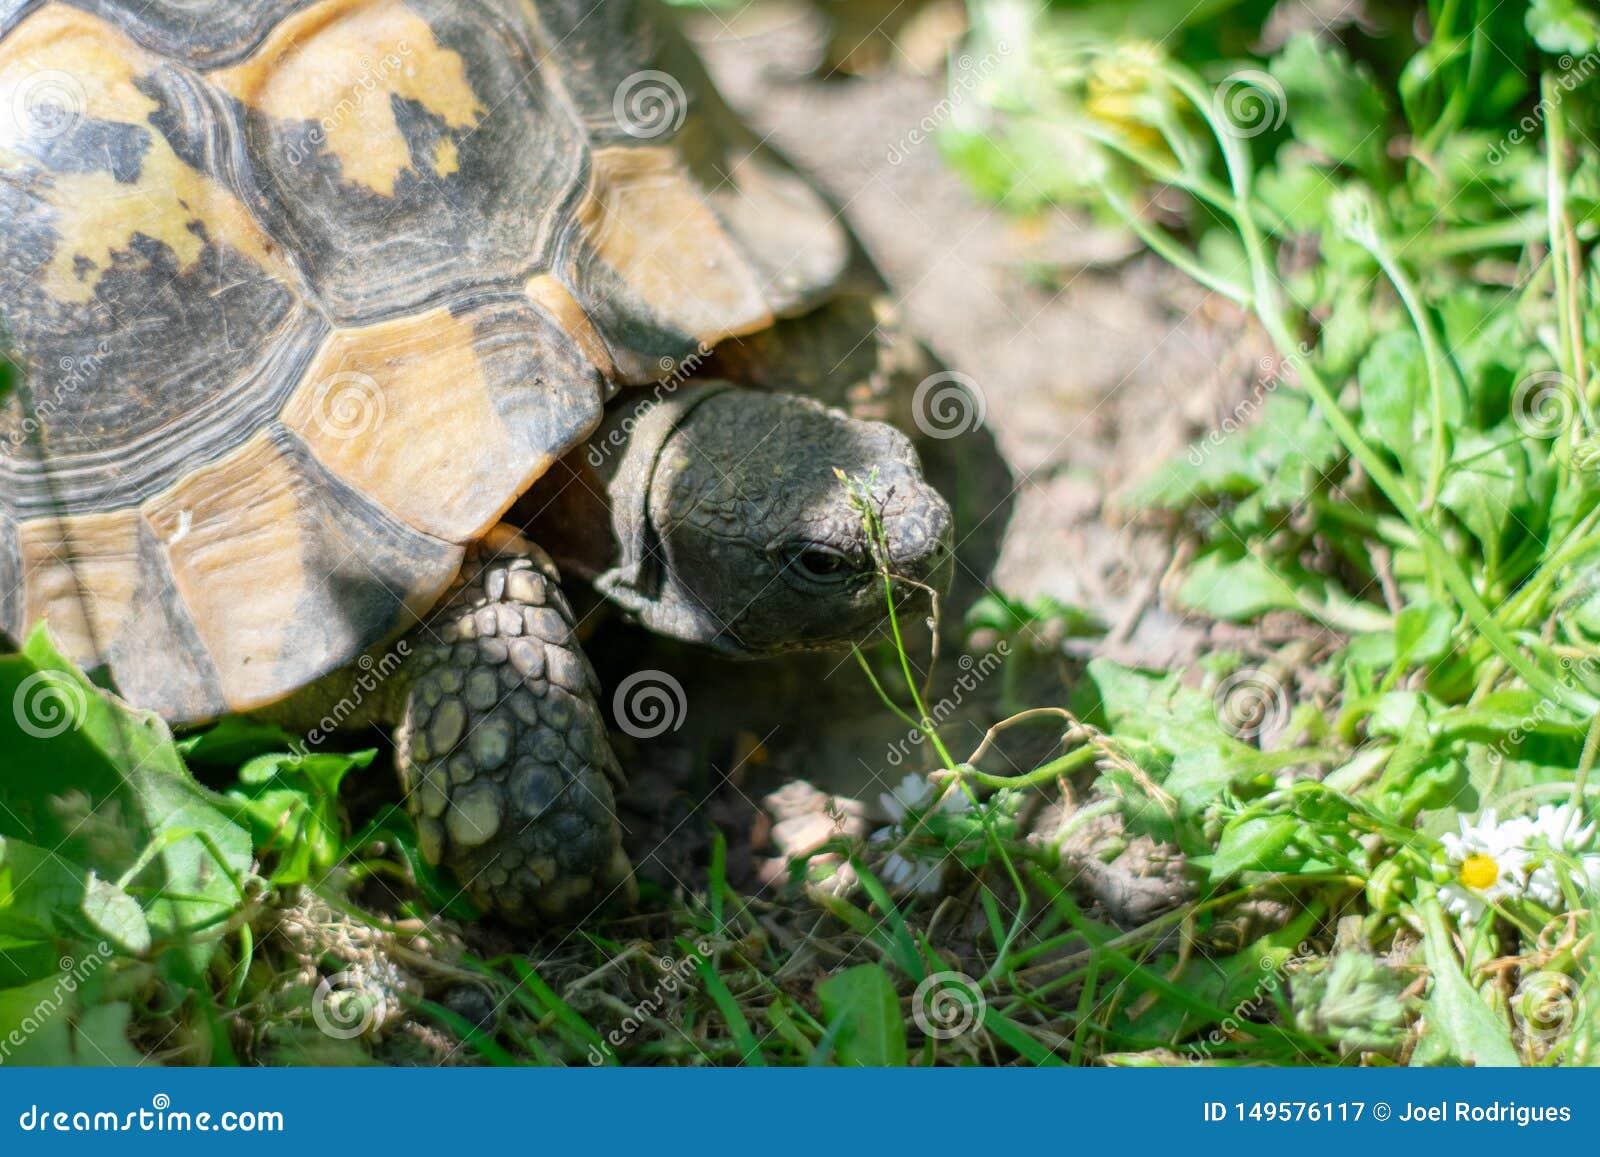 Hermann tortoise taking a stroll in green grass on sunny day